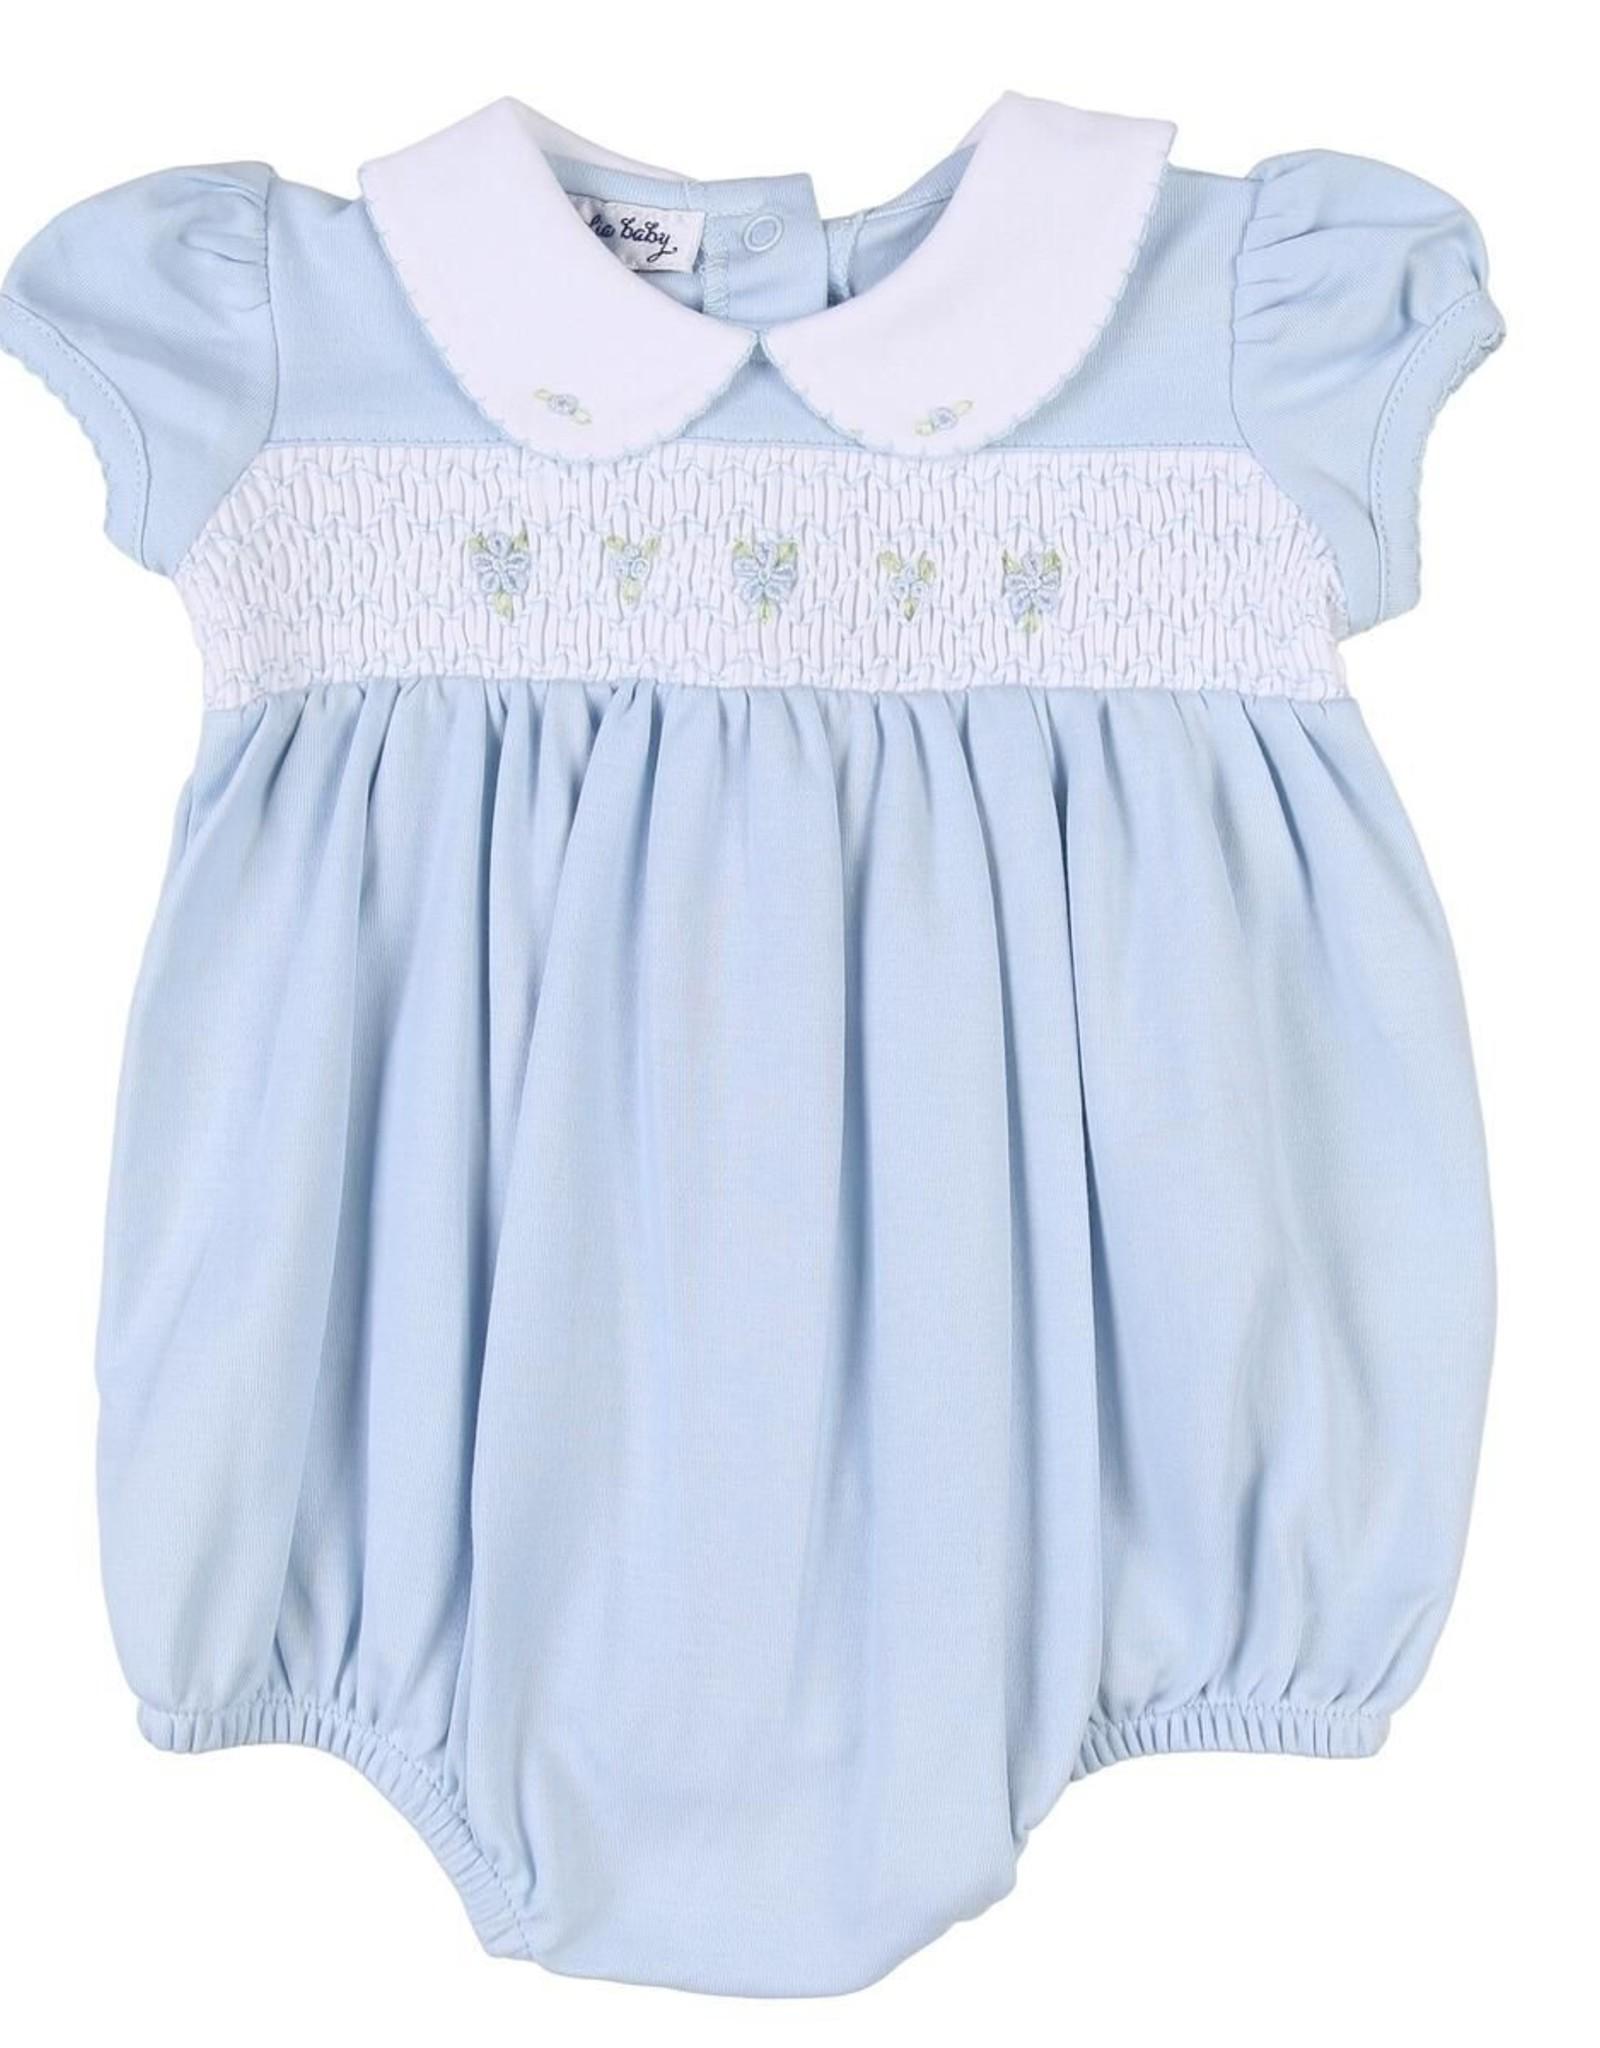 Magnolia Baby Elena & Elia's Smocked Collared Girls Bubble - Blue